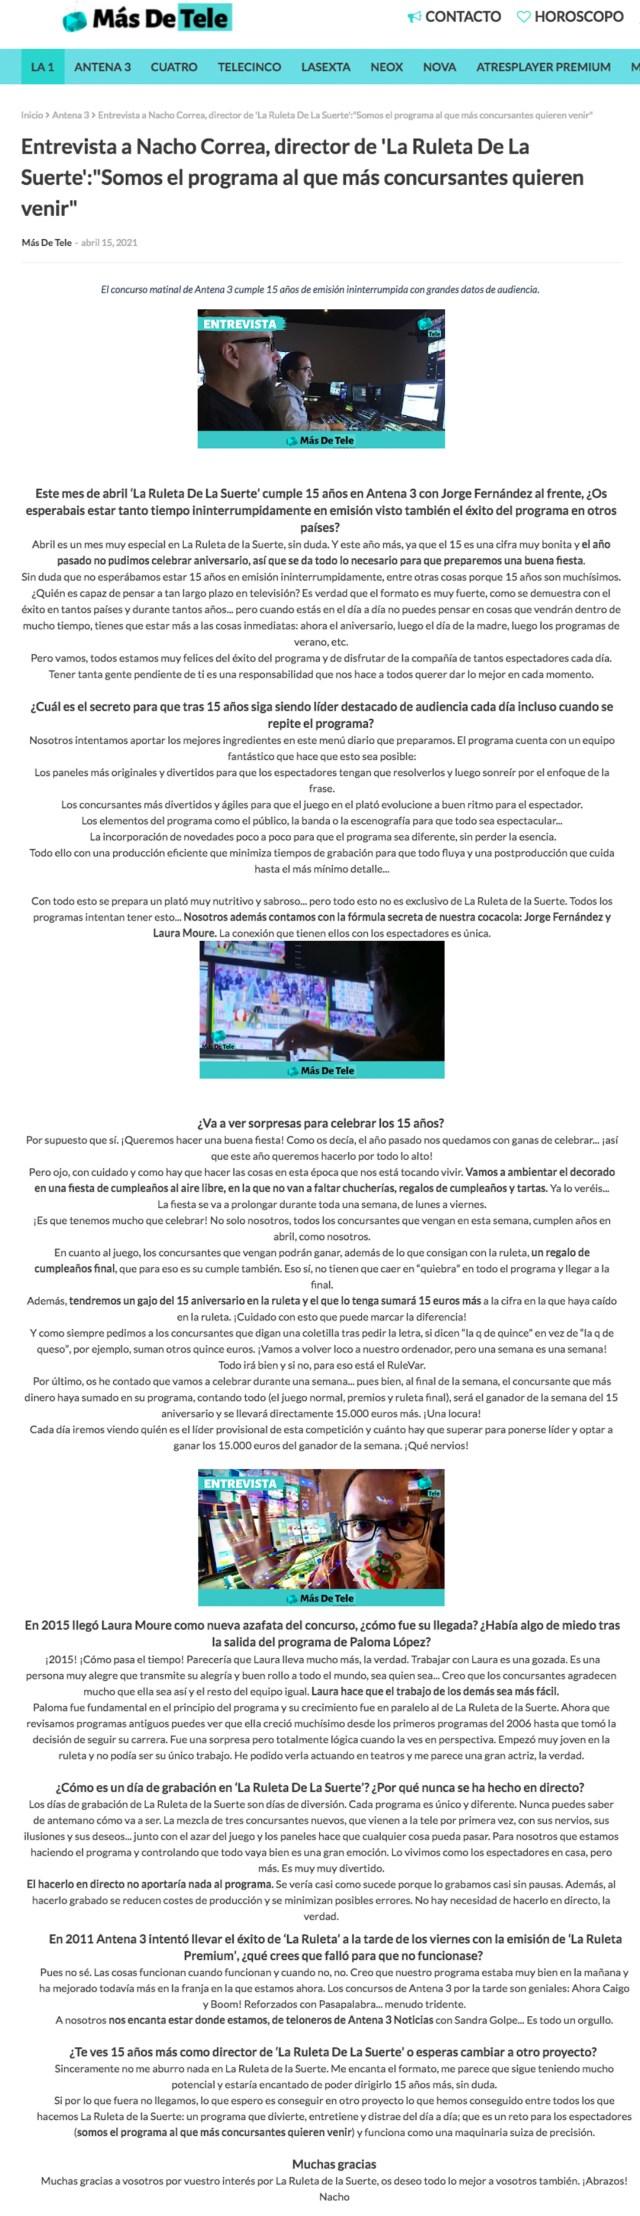 Entrevista a Nacho Correa - Más de tele